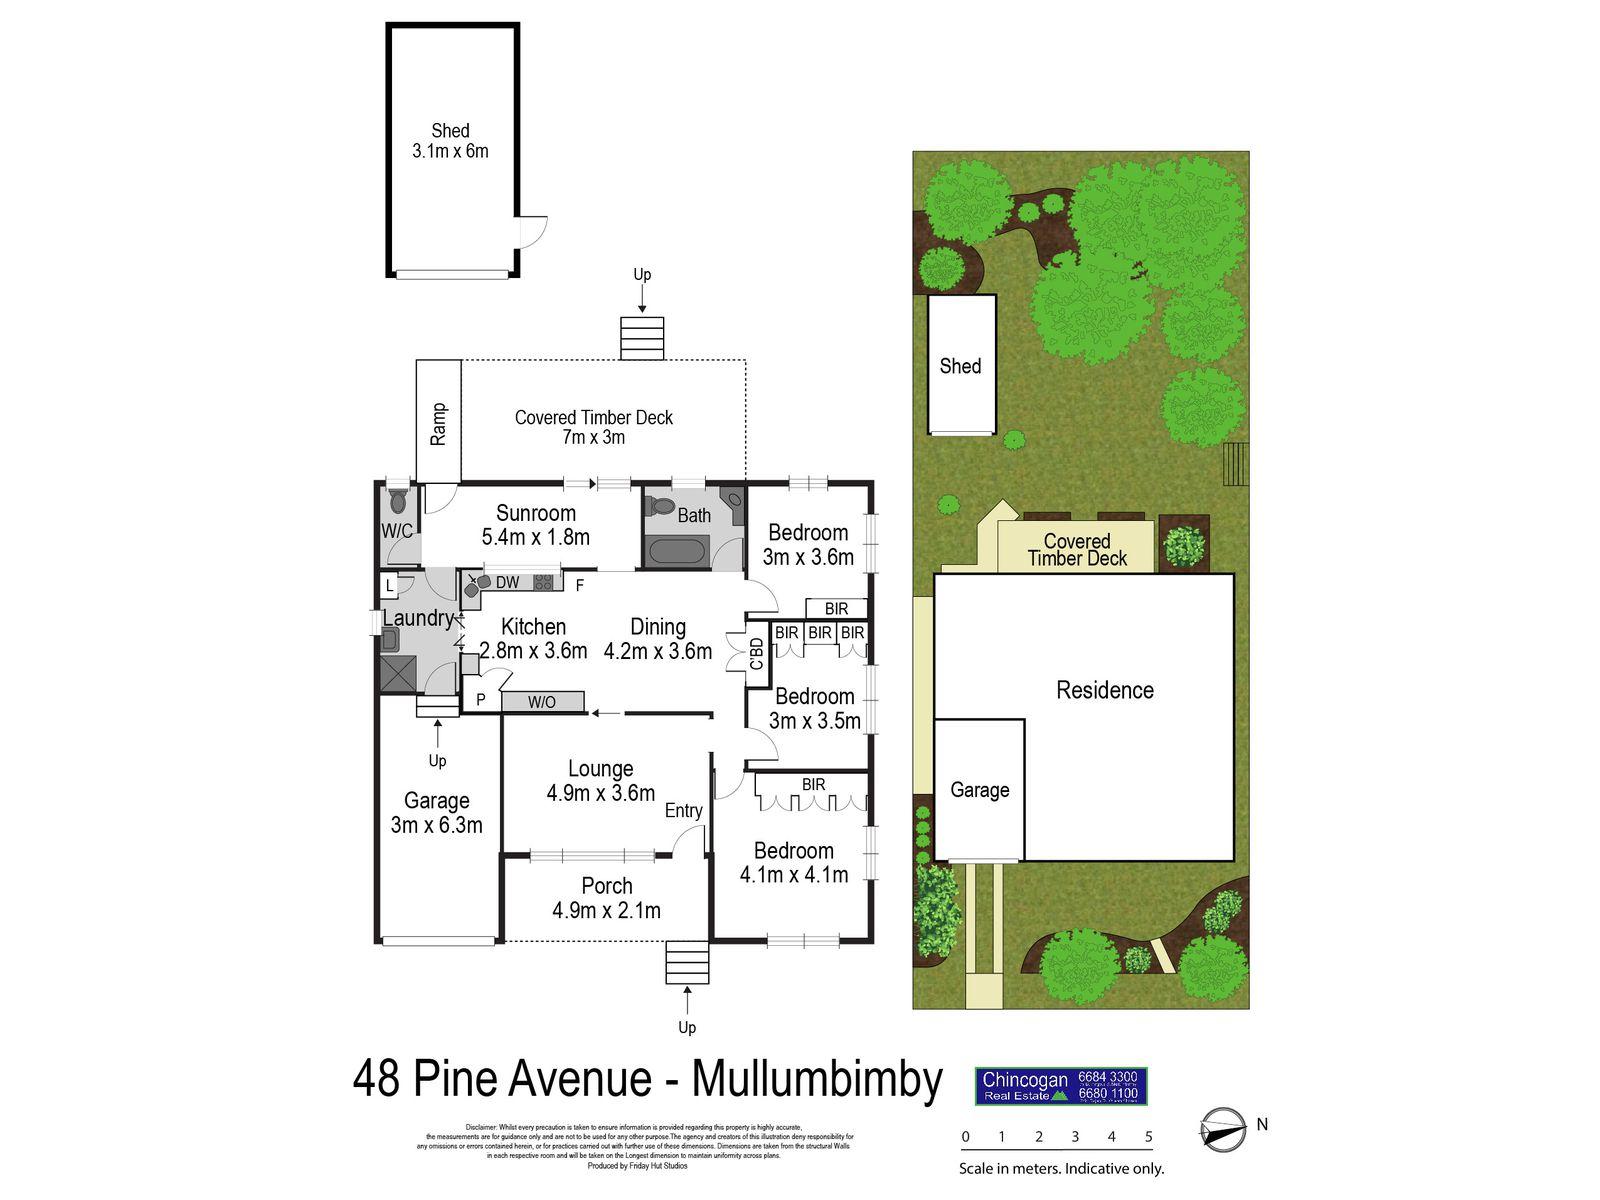 48 Pine Avenue, Mullumbimby